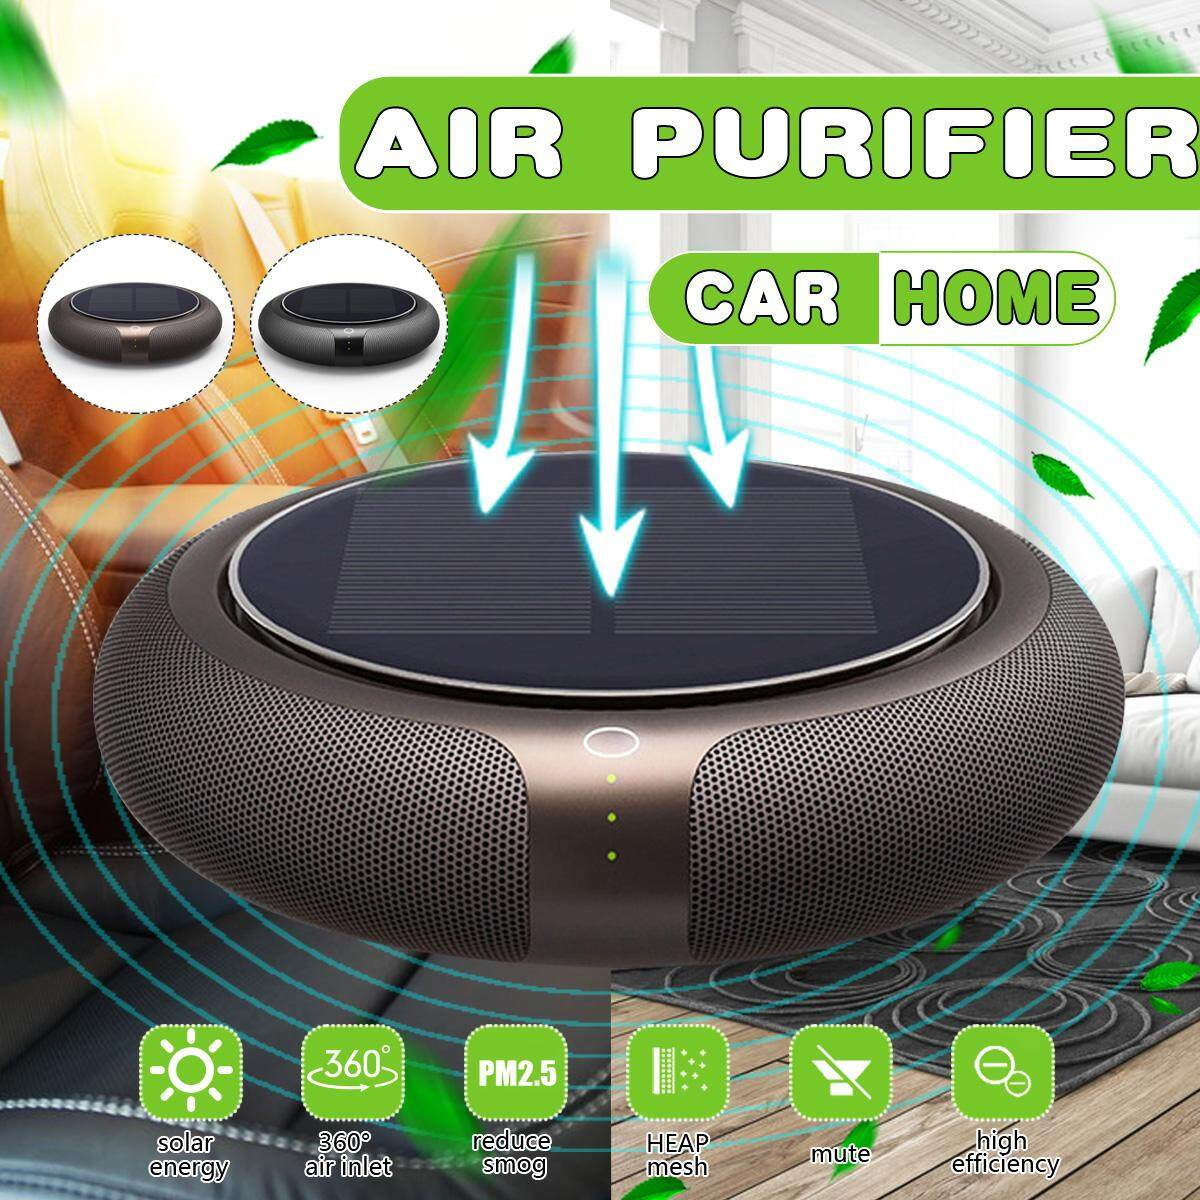 Portable Solar Vehicle Formaldehyde Air Smog Purifier Anion Diffuser Car Home